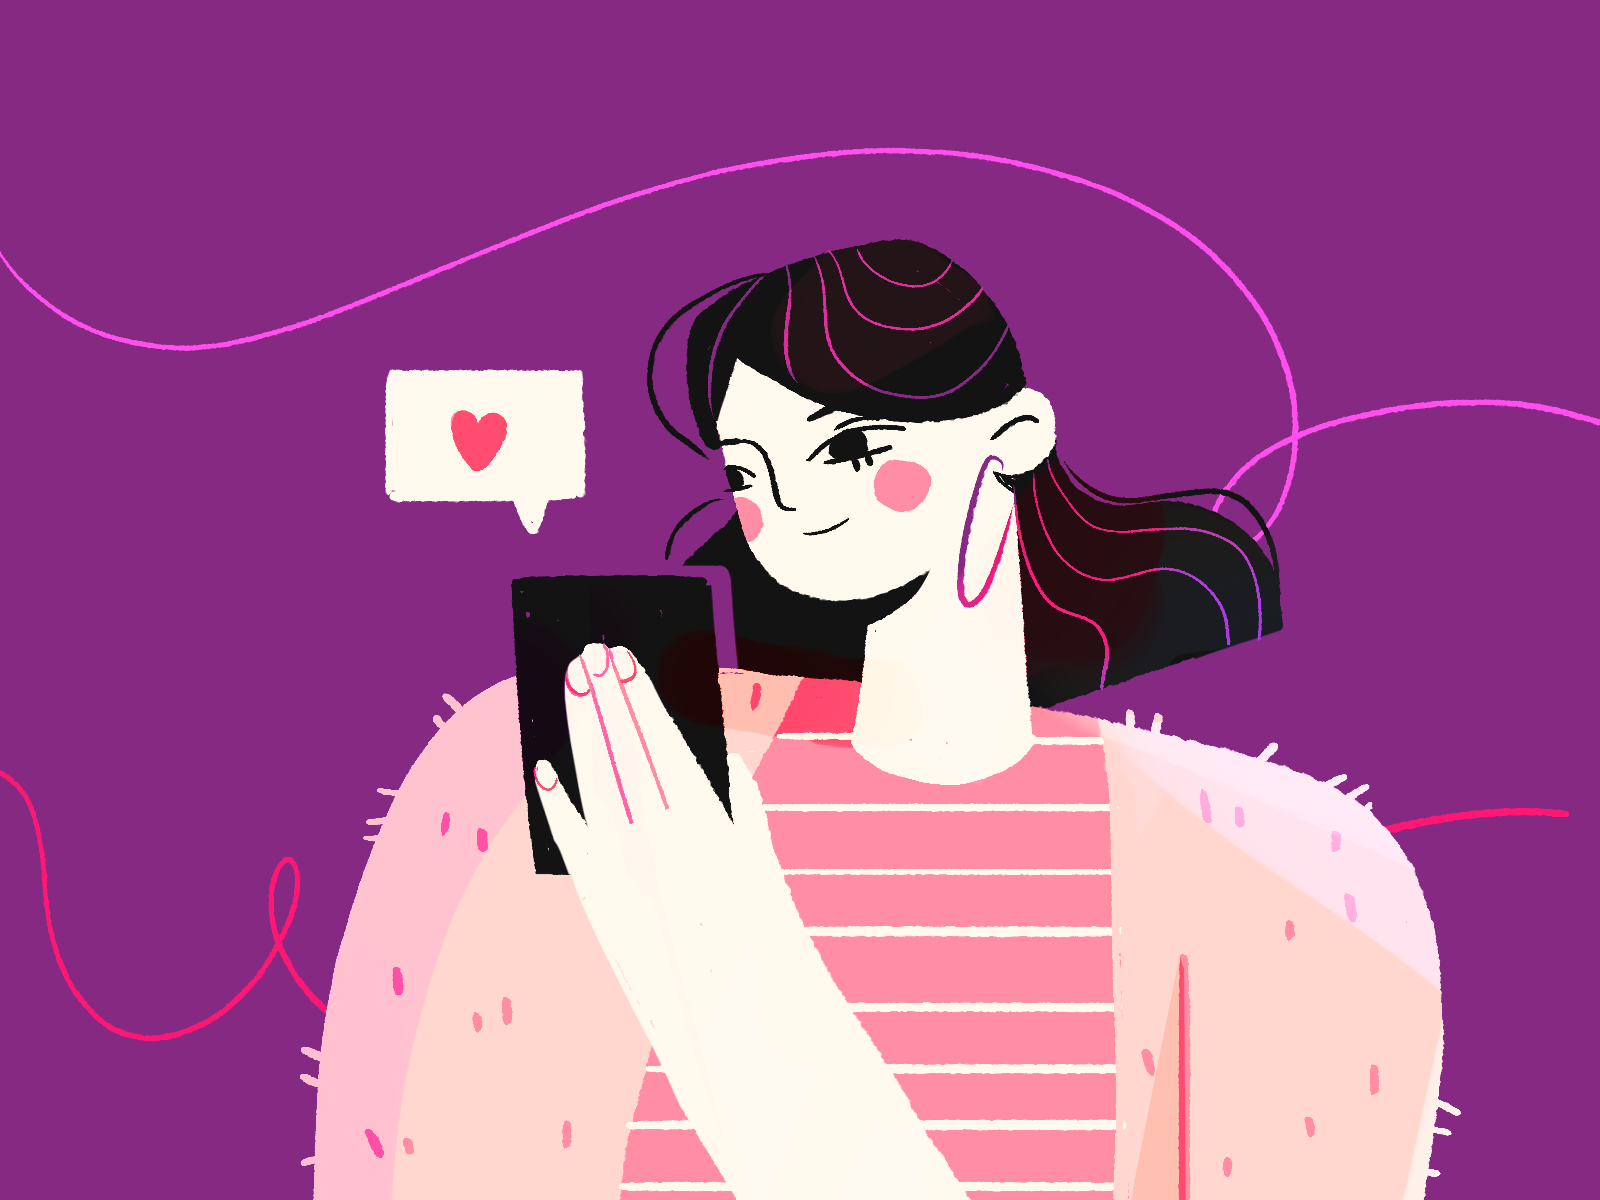 digital art love